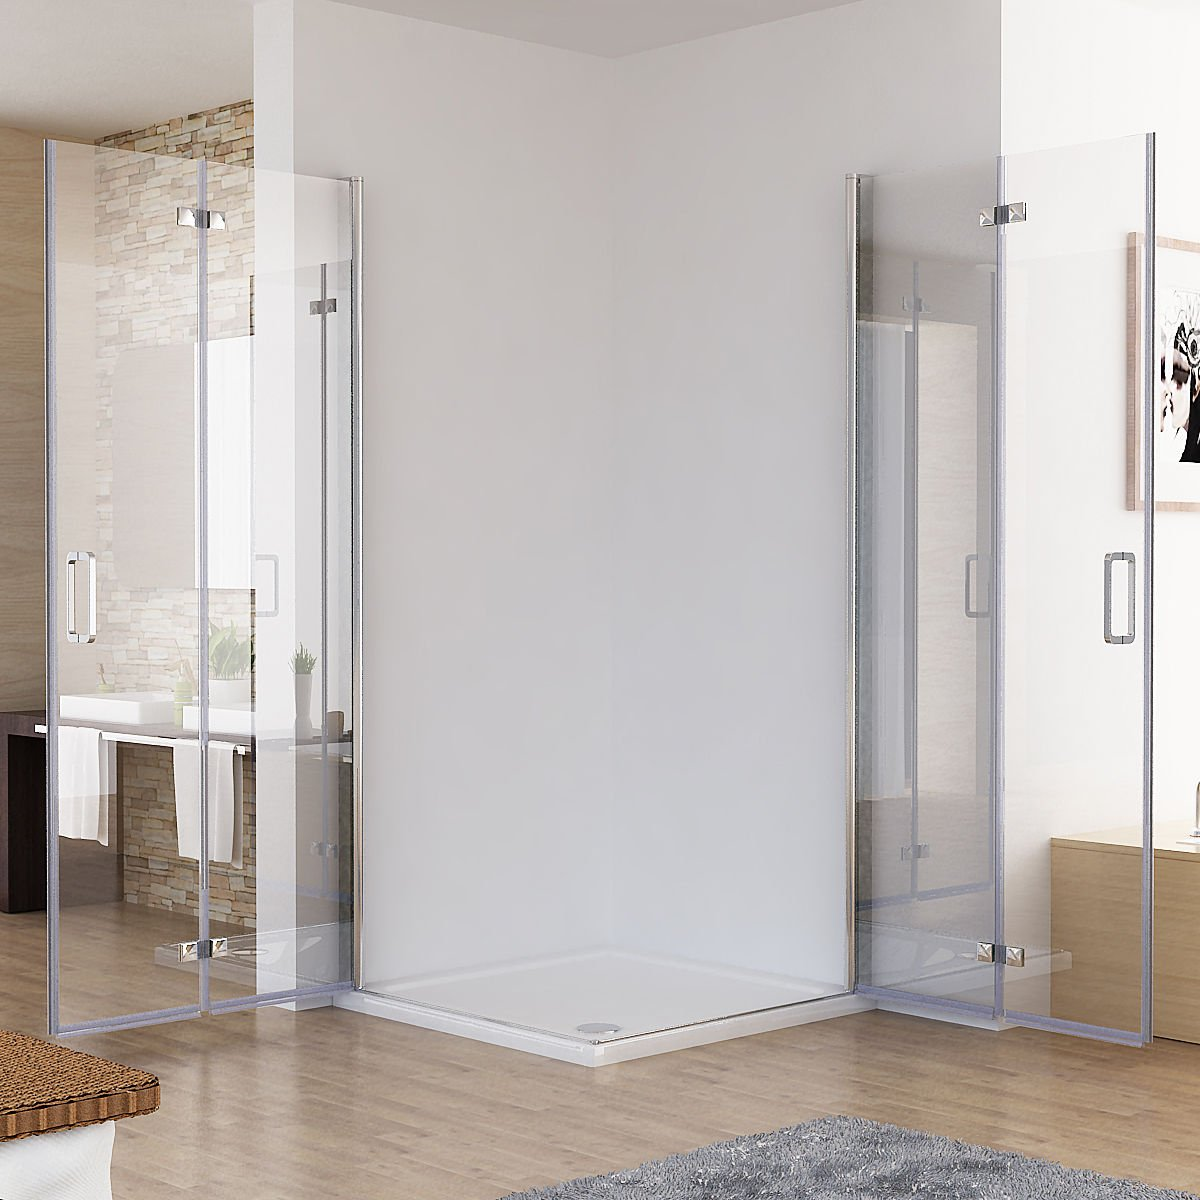 100 X 80 X 197 Cm cabinas de ducha esquina. Ducha Puerta plegable ...